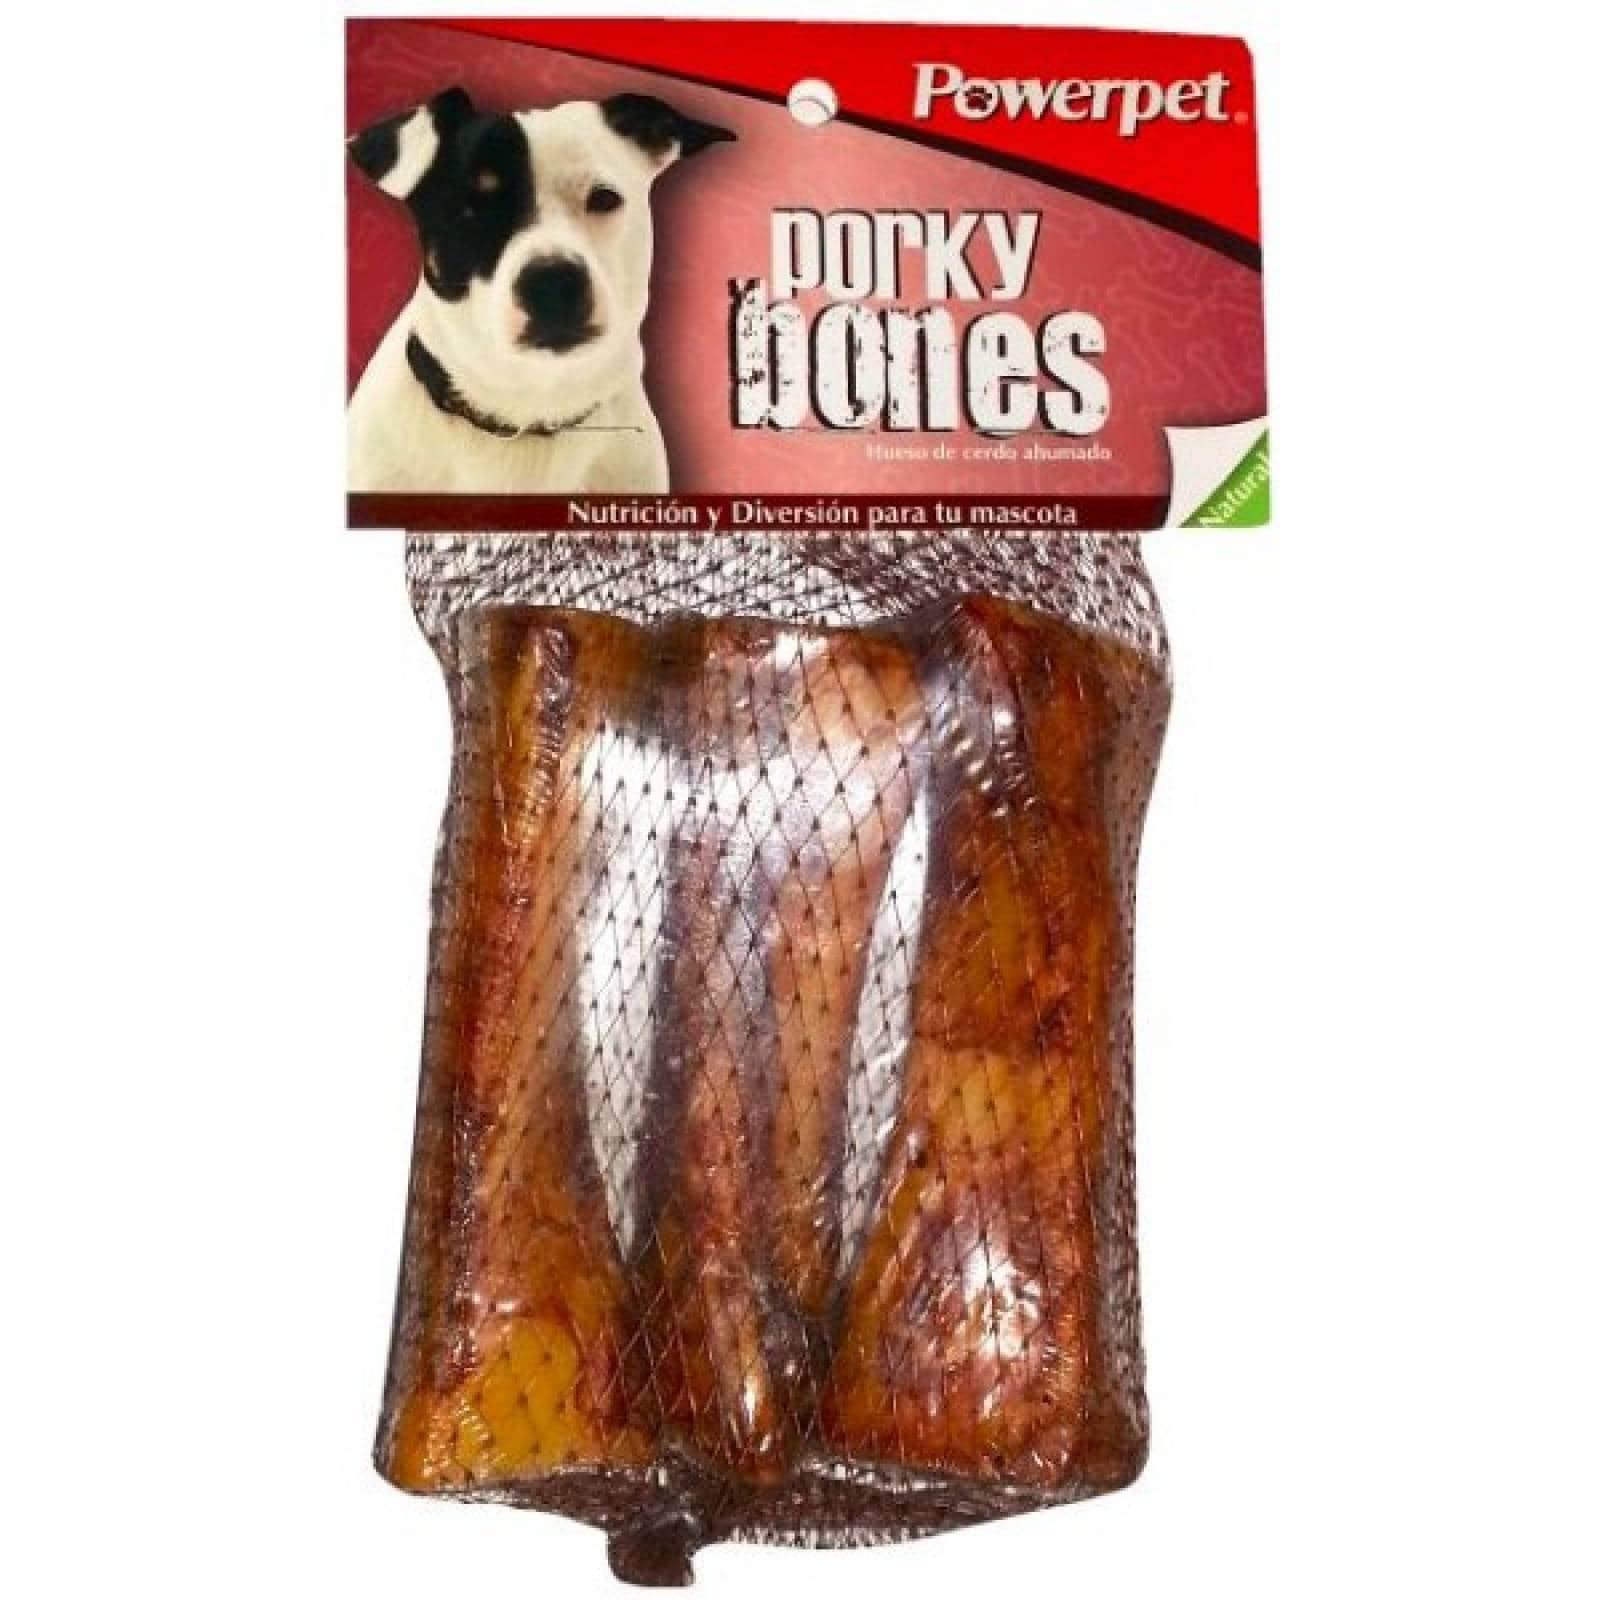 Powerpet Premio de Carnaza para Perro Hueso de Puerco para masticar 3 pz